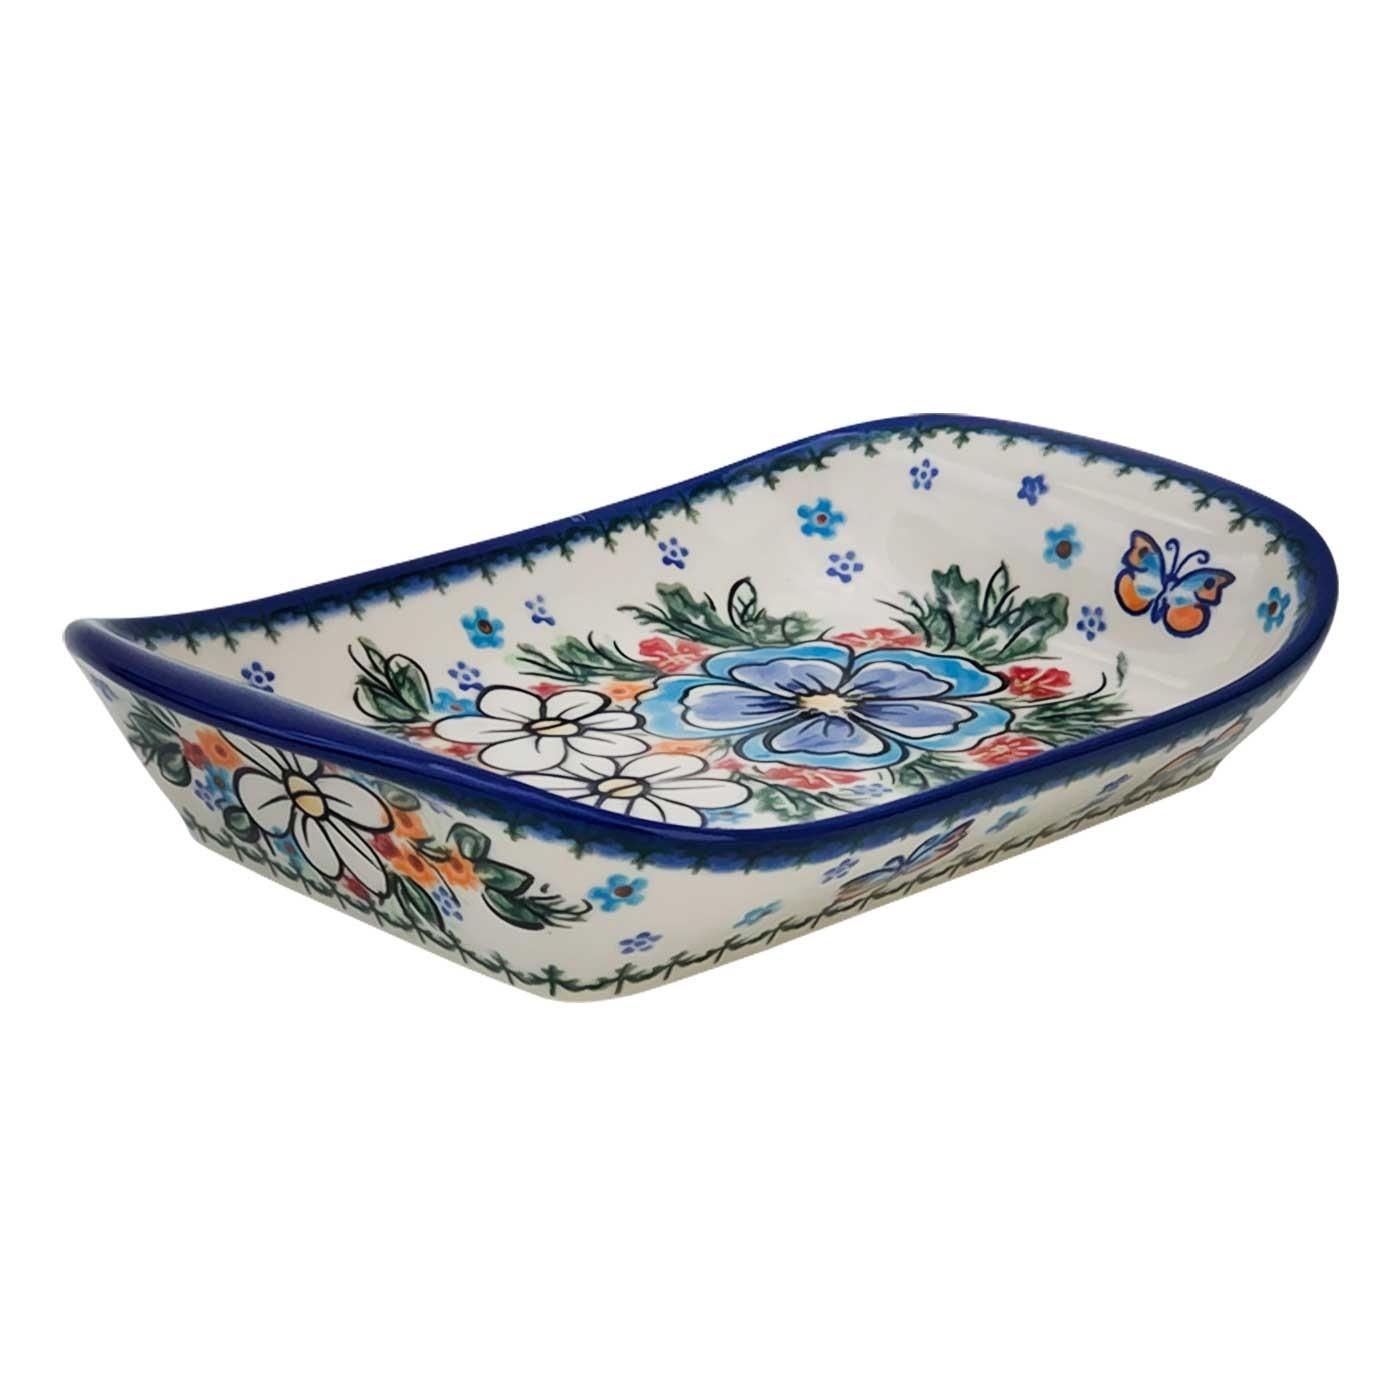 Pottery Avenue Stoneware Flared Dish - V107-A300 ADORABLE